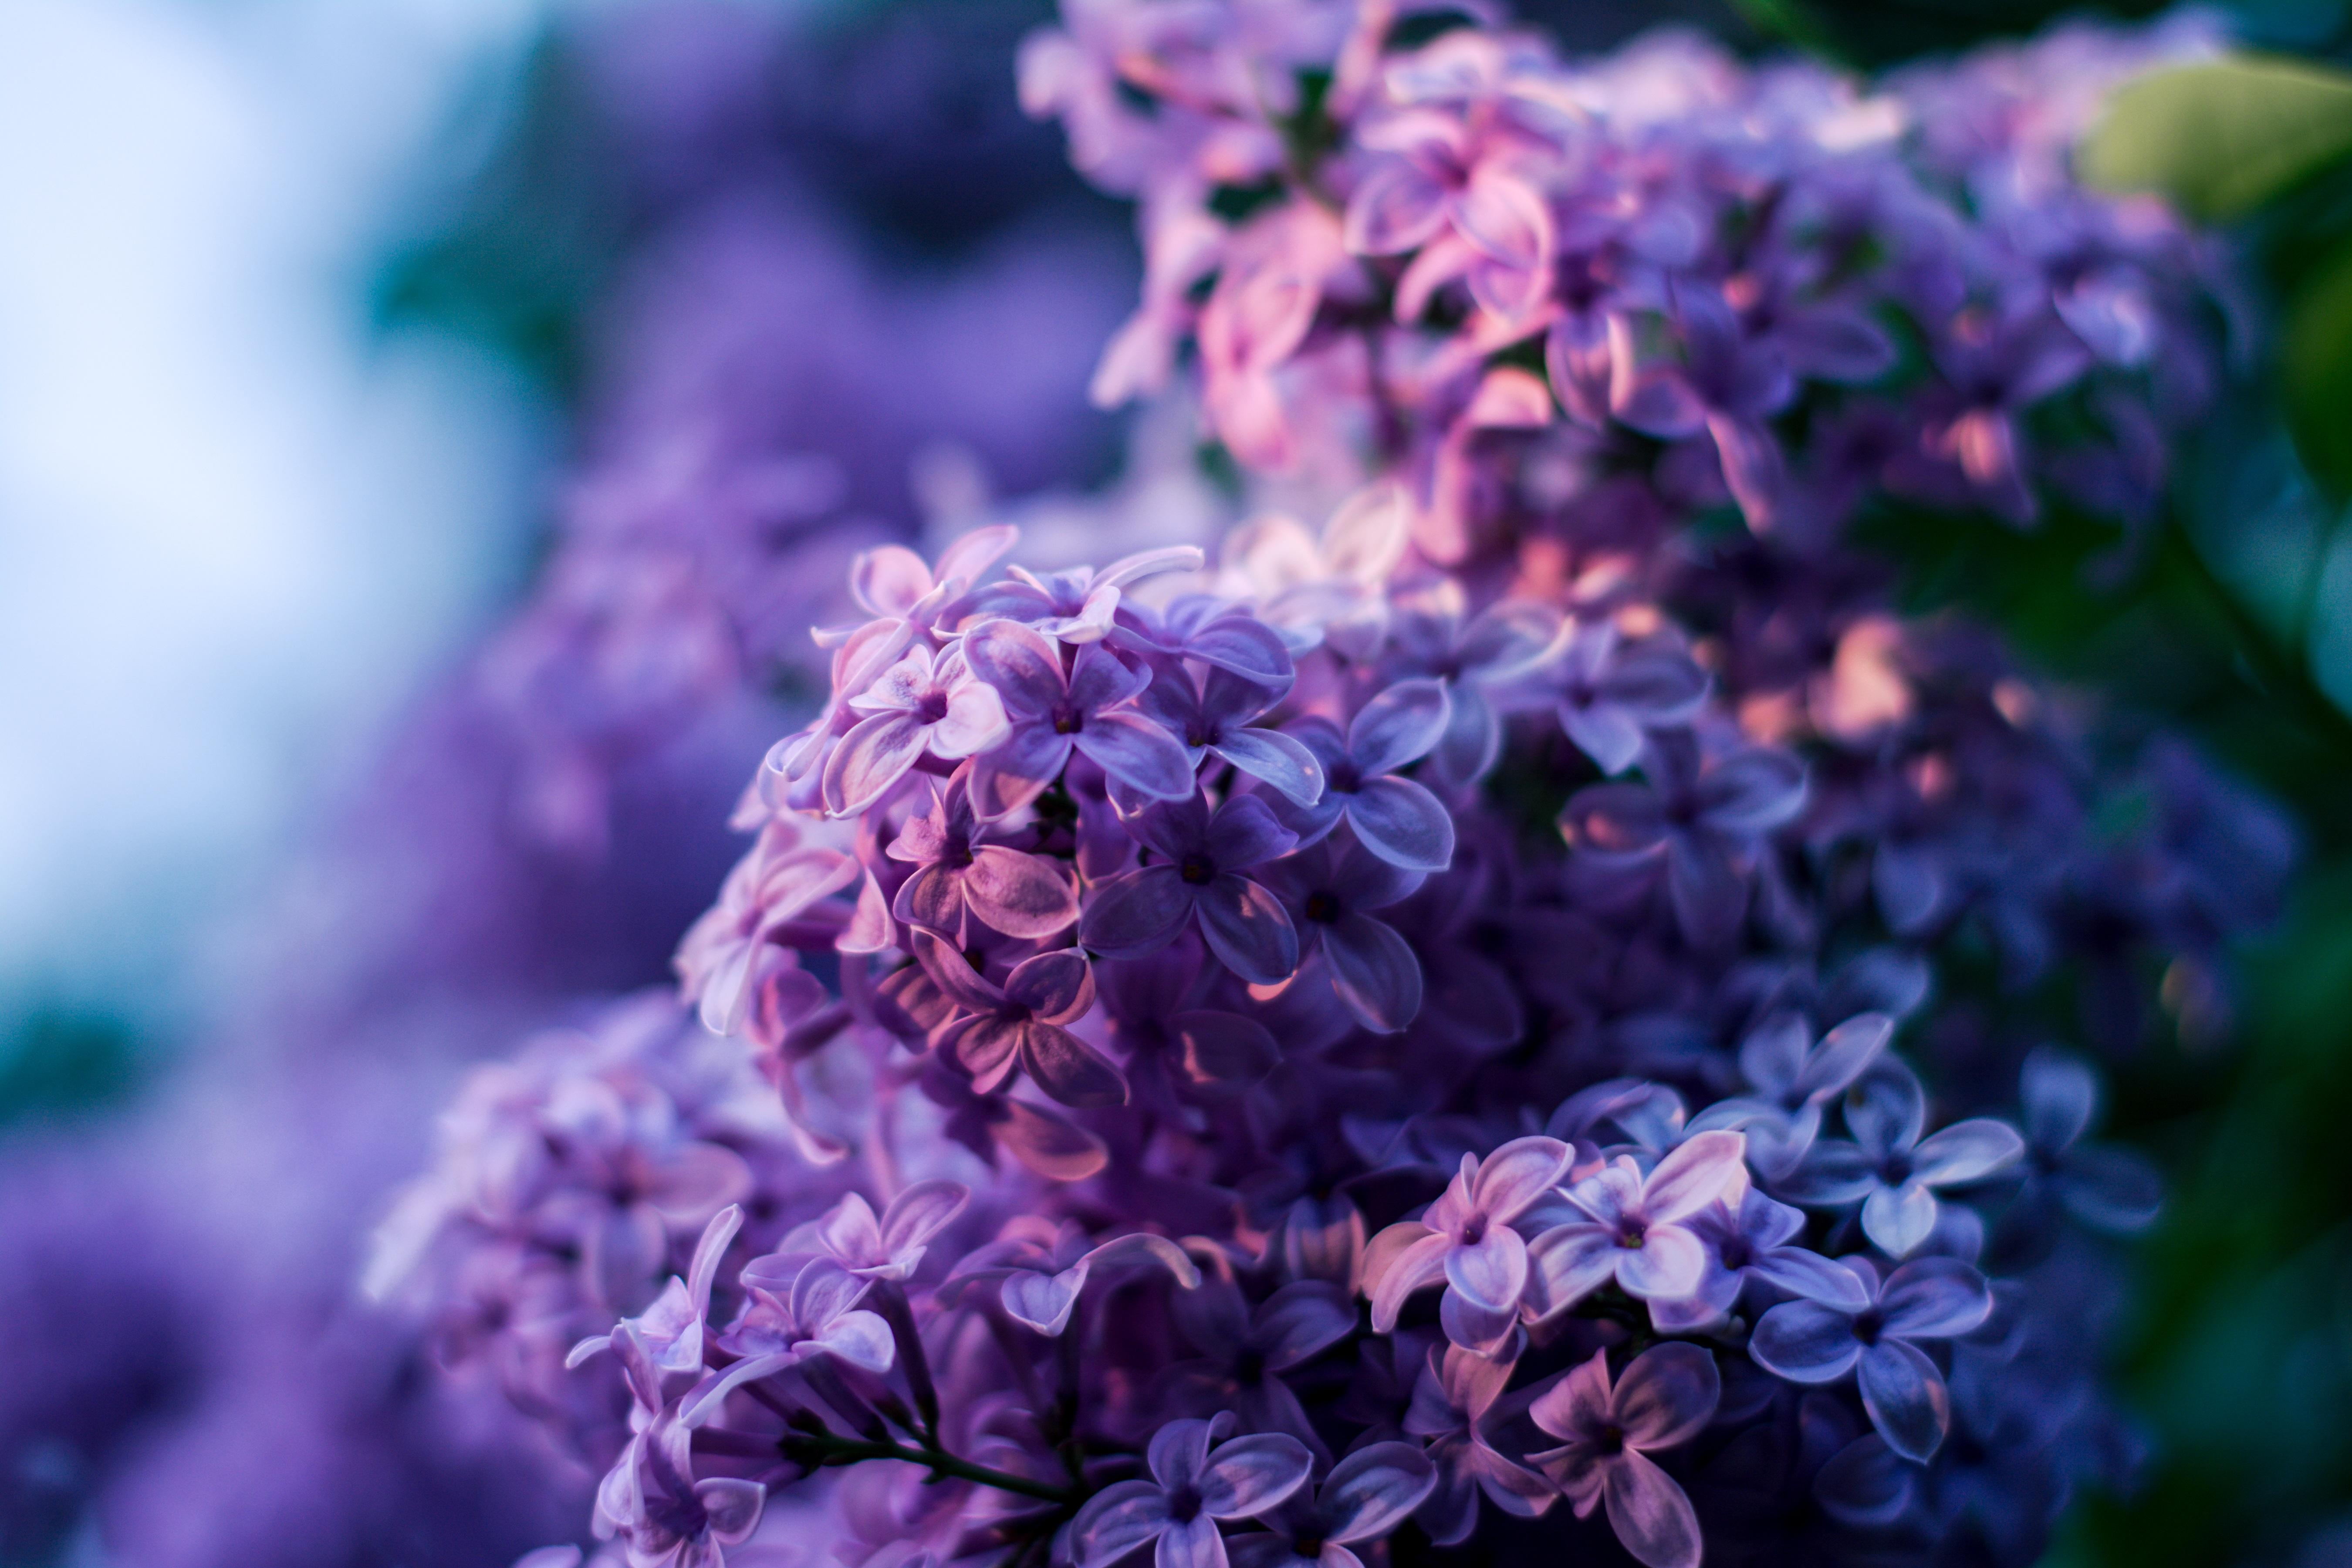 Free Images Nature Blossom Bokeh Petal Bloom Botany Blue